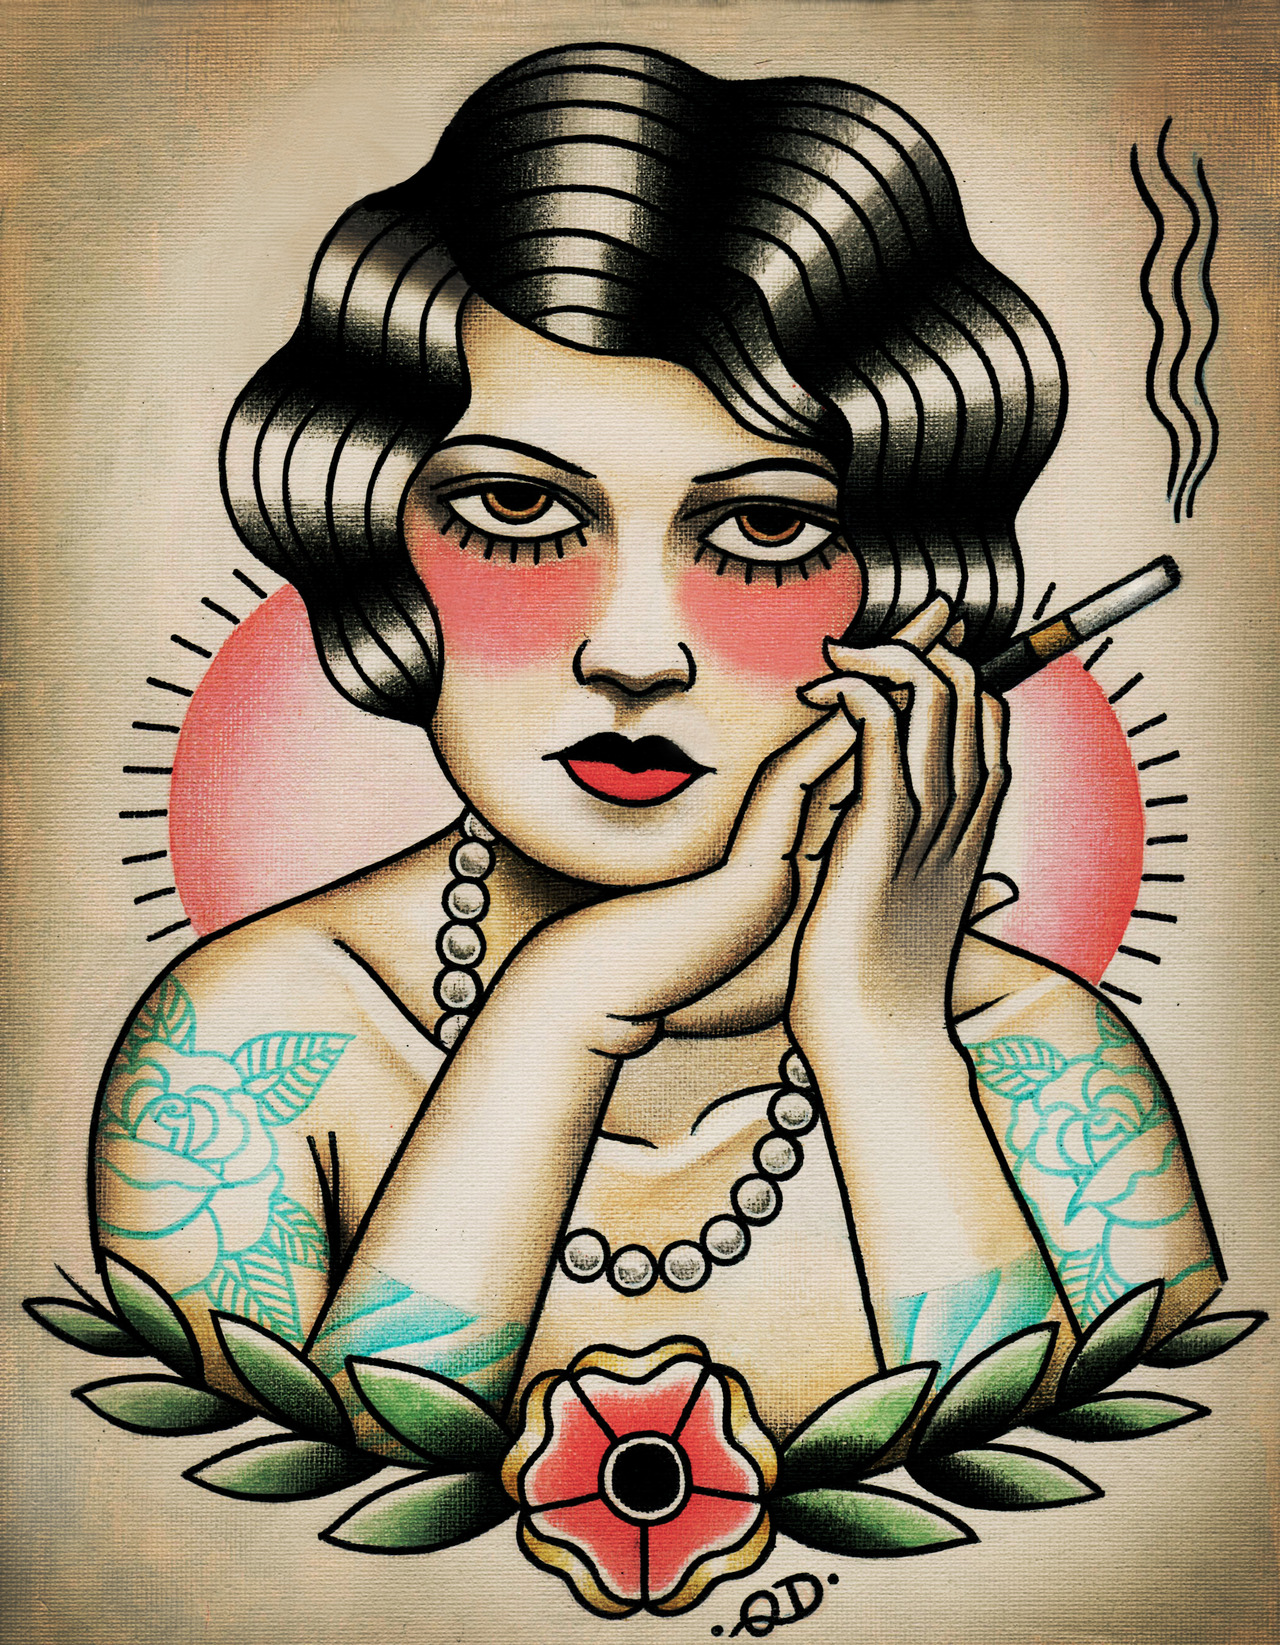 Pin By Jose Cruz De La Paz Tirado On Tattoos And Ideas American Traditional Tattoo Traditional Tattoo Old School Tattoo